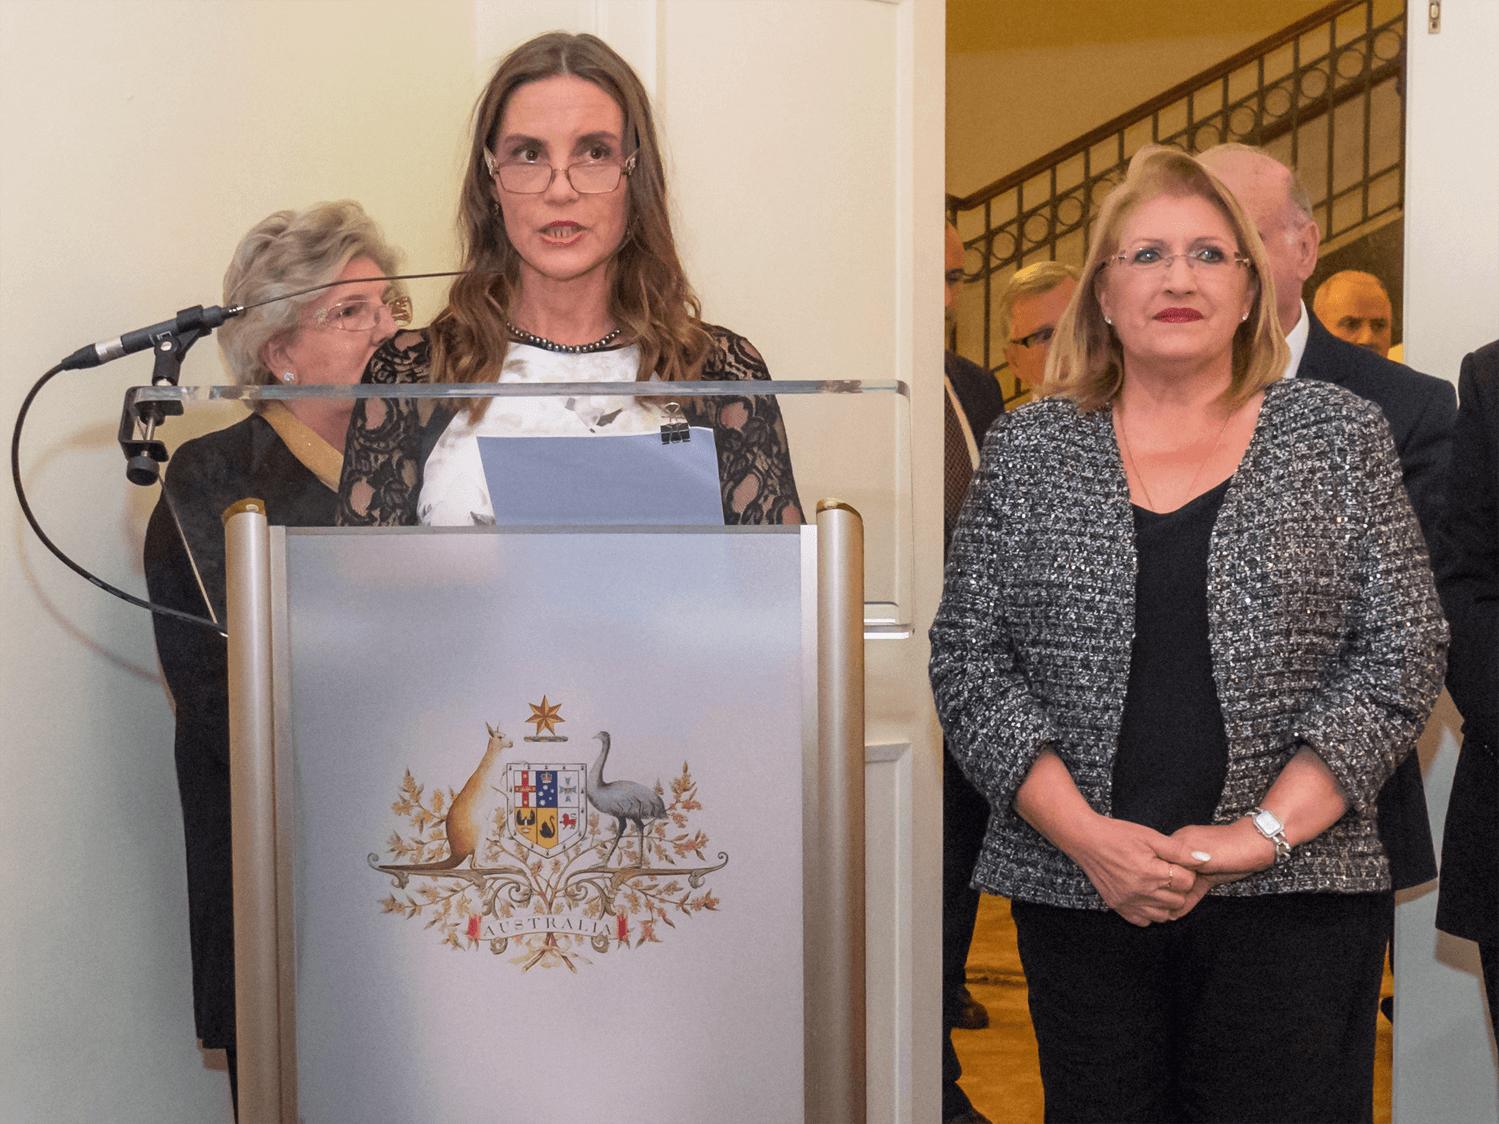 Australian High Commissioner to Malta Julienne Hince with Malta's President Marie-Louise Coleiro Preca, on Australia Day 2017.